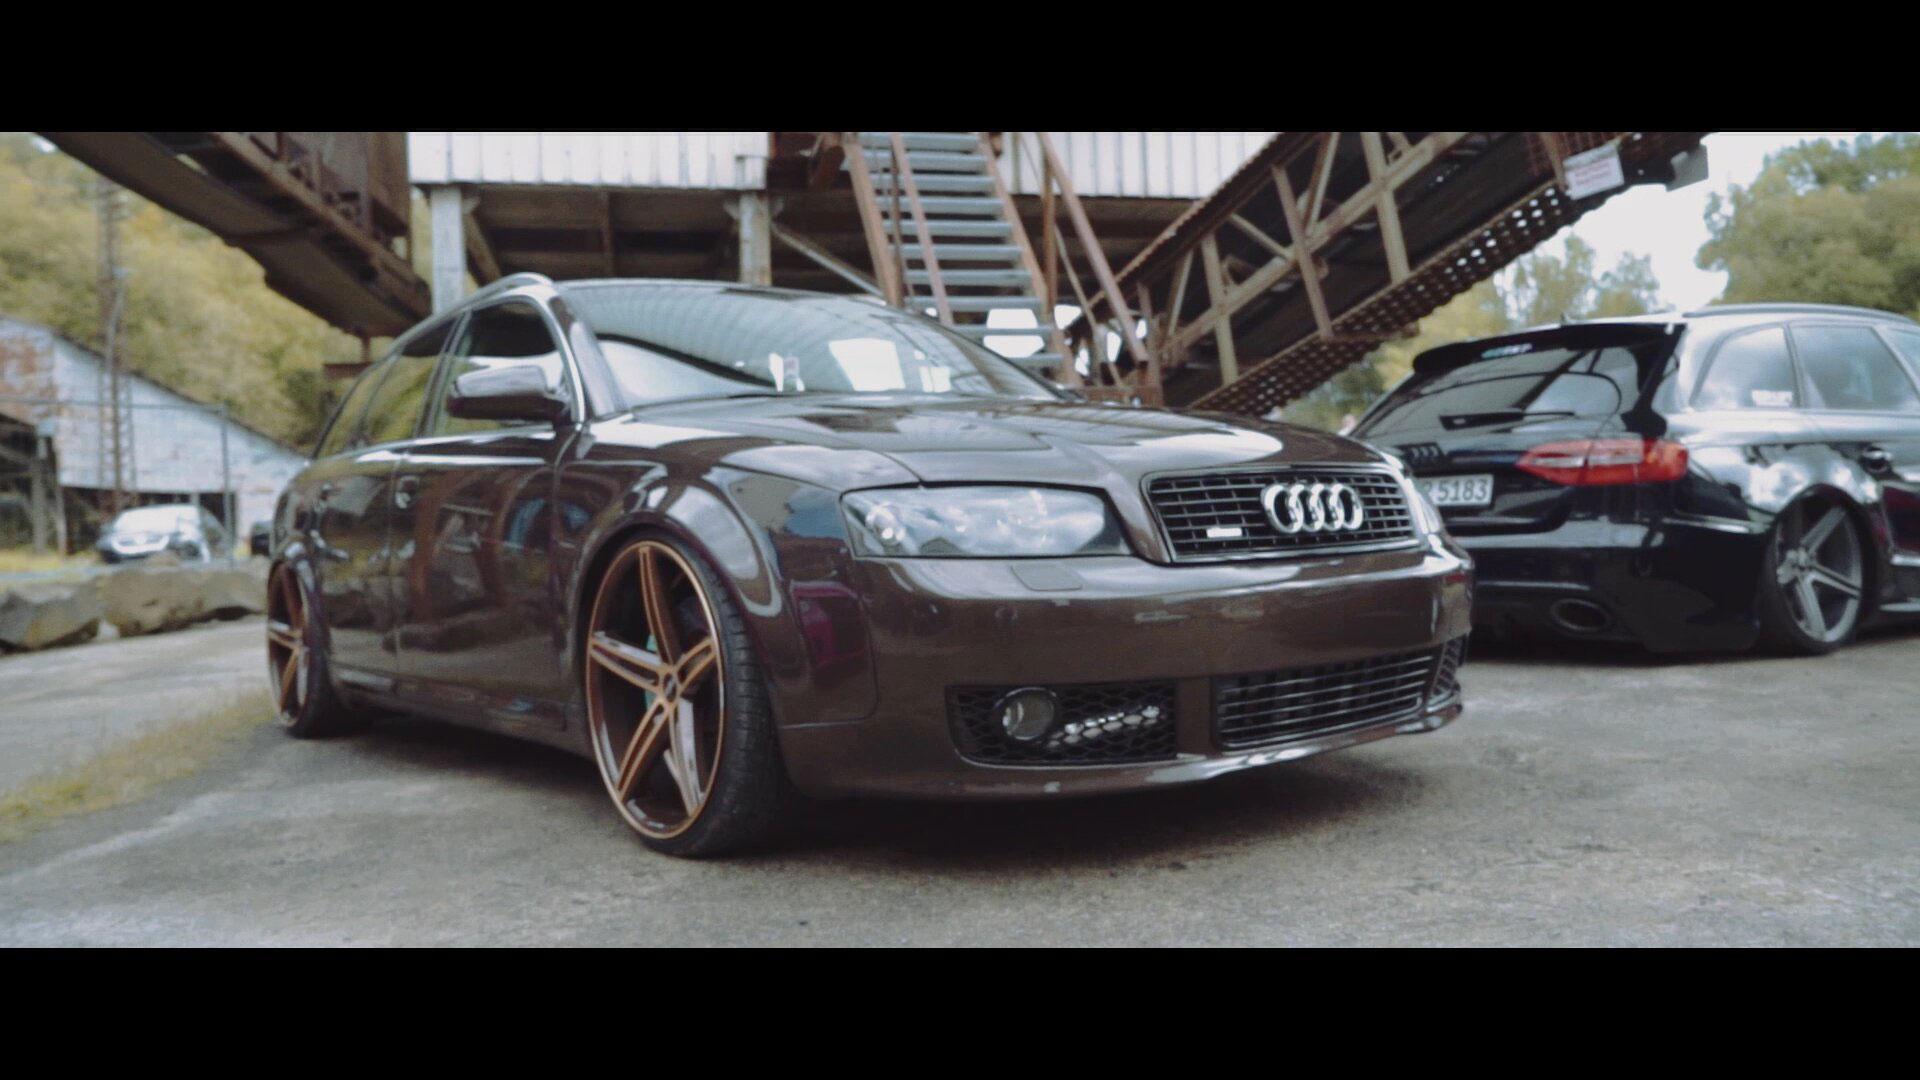 Audi A4 Avant mit OX18 Brown Gold Polish